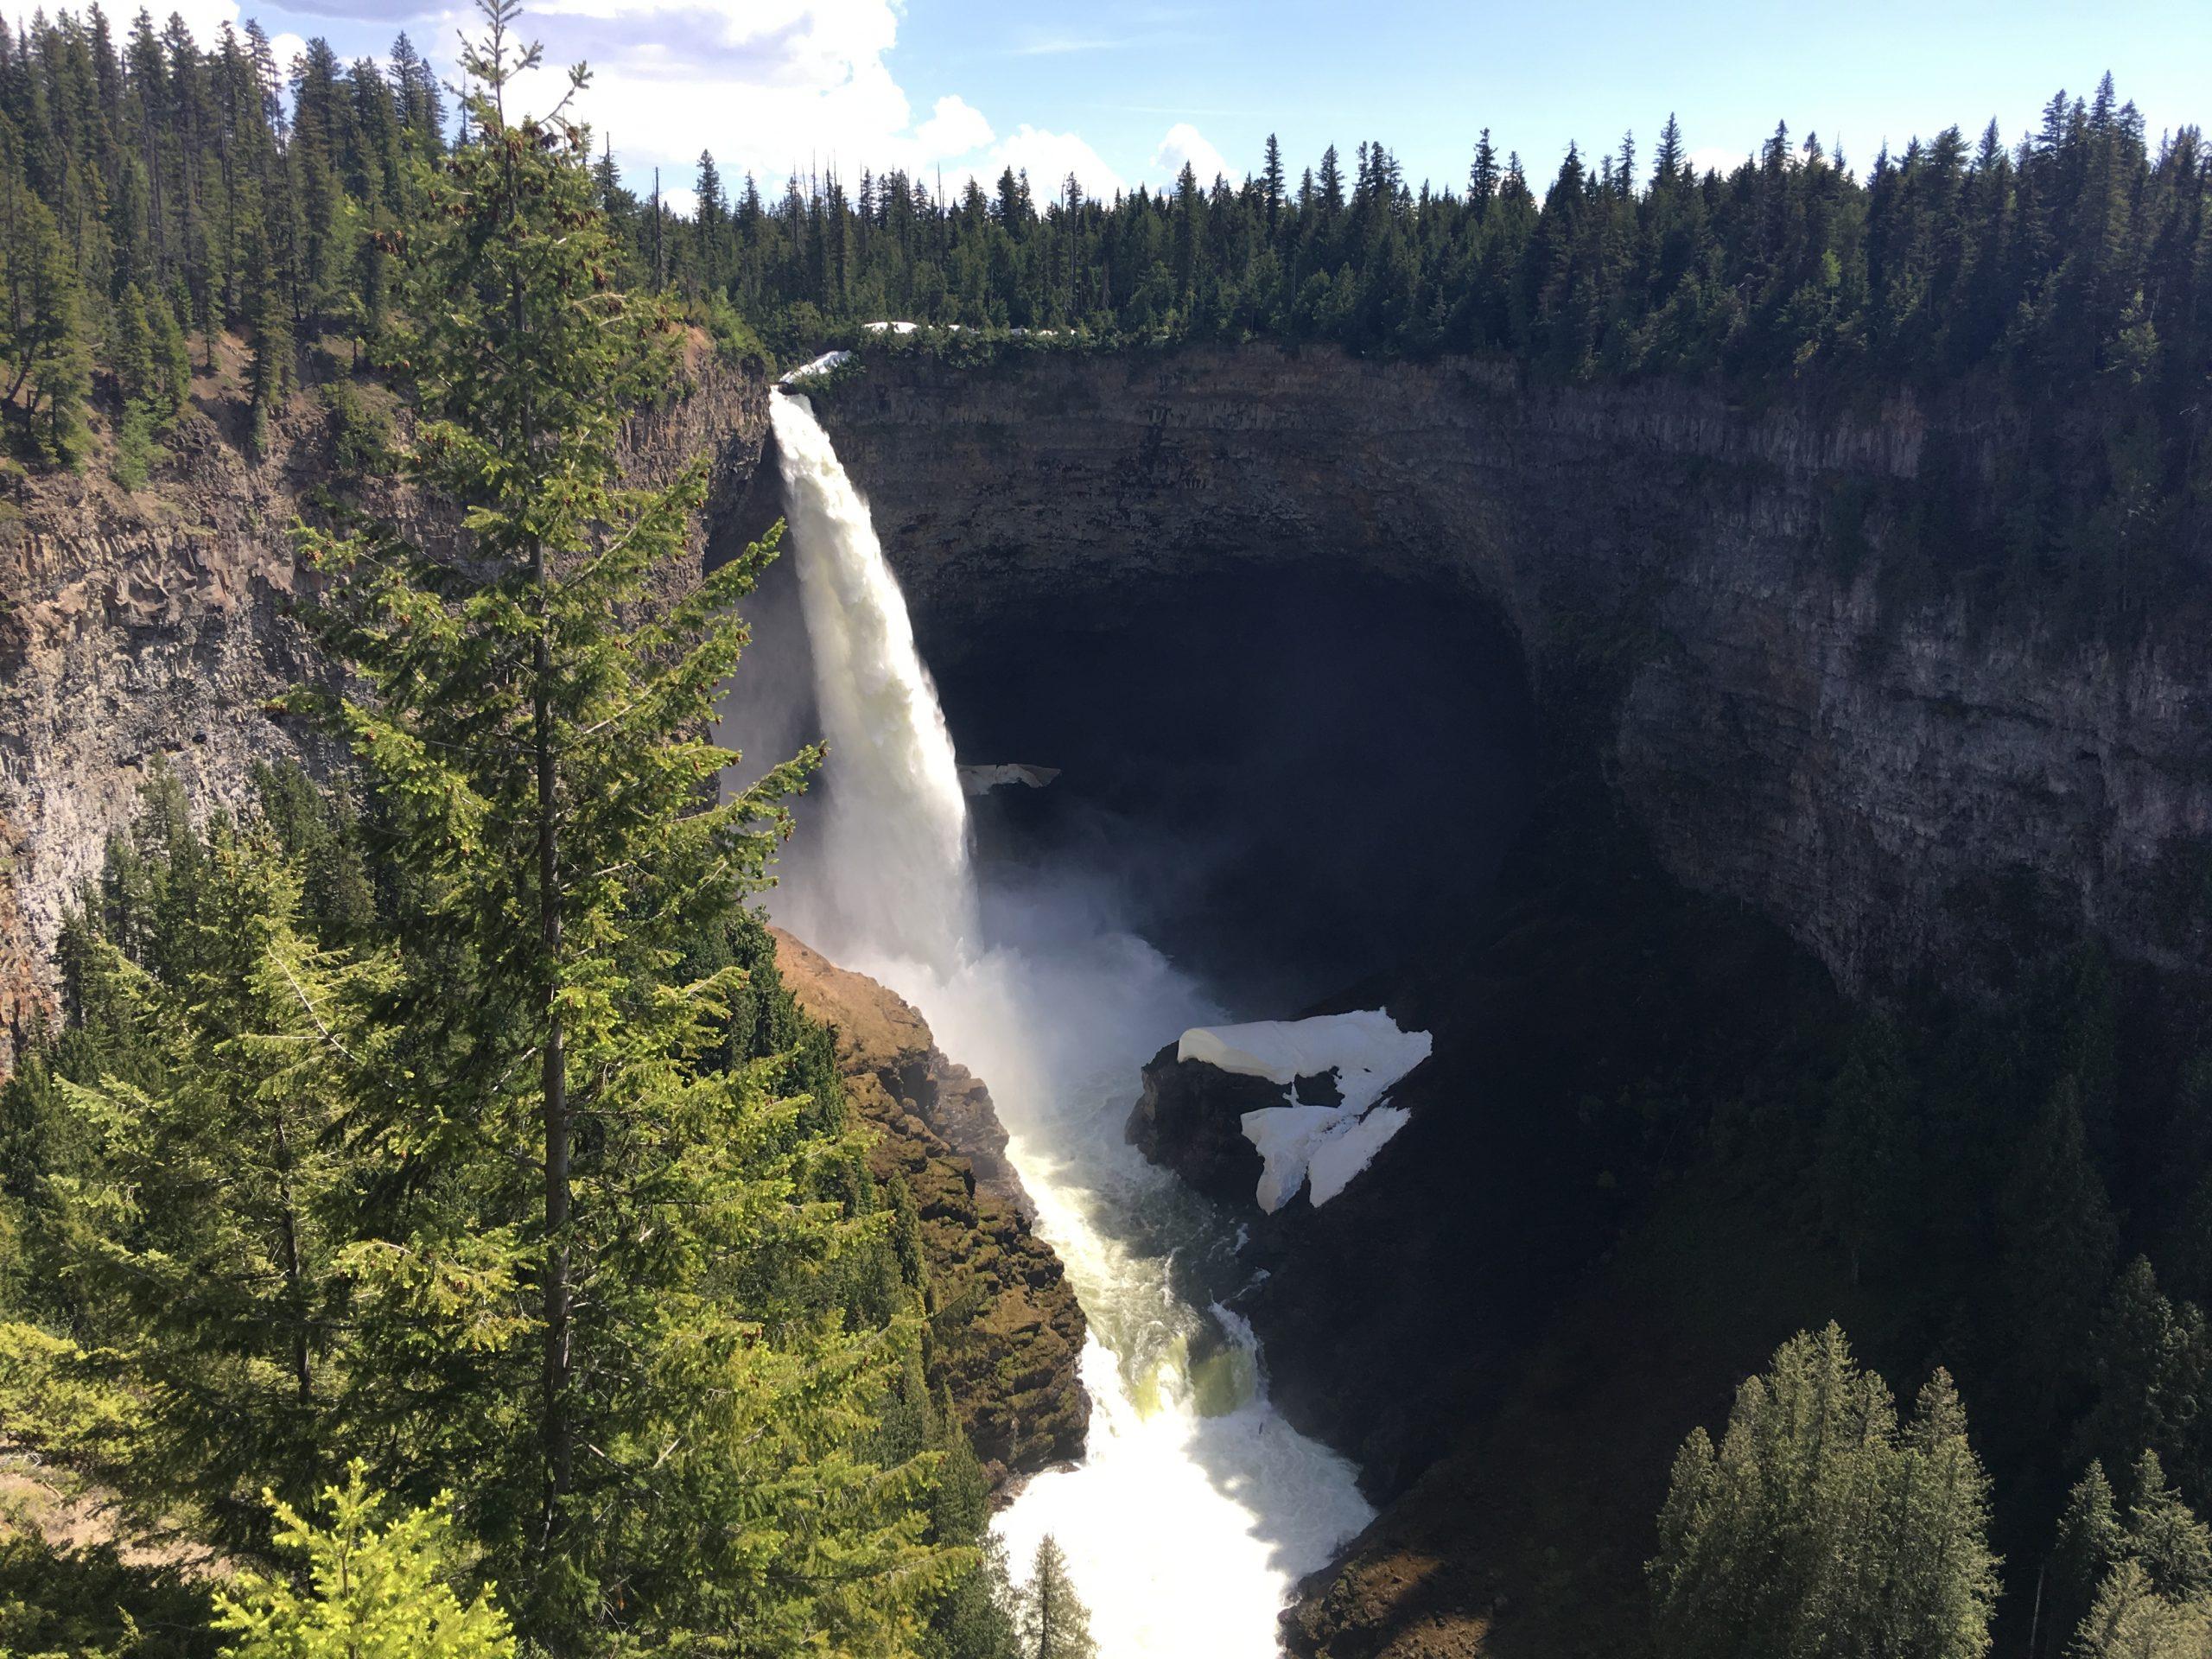 Waterfalls, Helmcken Falls, Wells Gray Park, British Columbia Canada